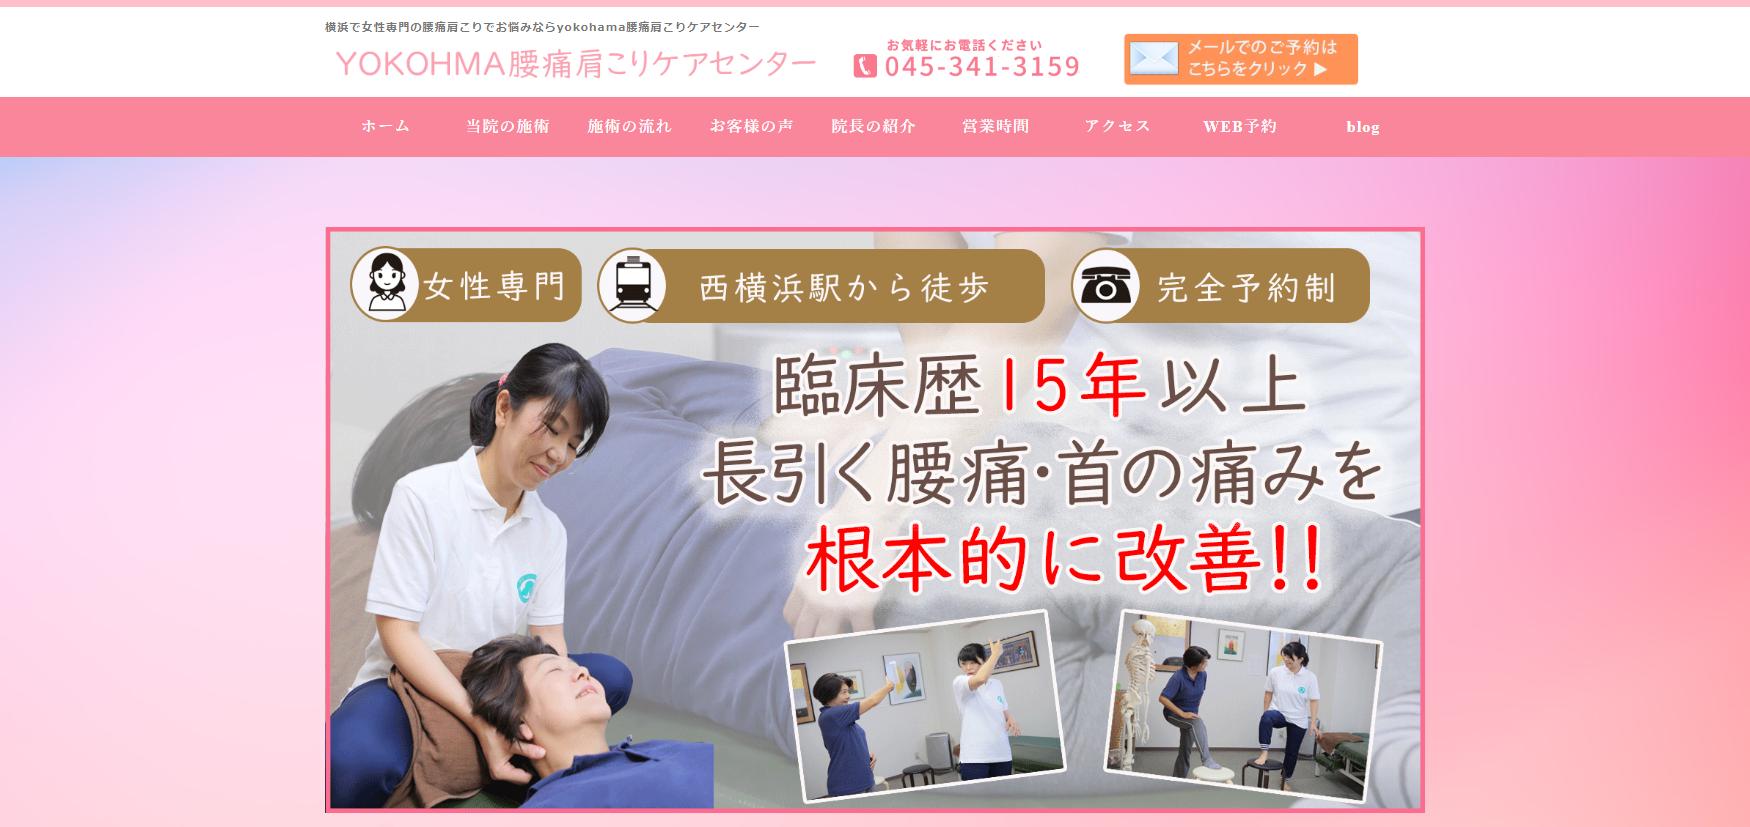 YOKOHAMA腰痛肩こりケアセンターのサムネイル